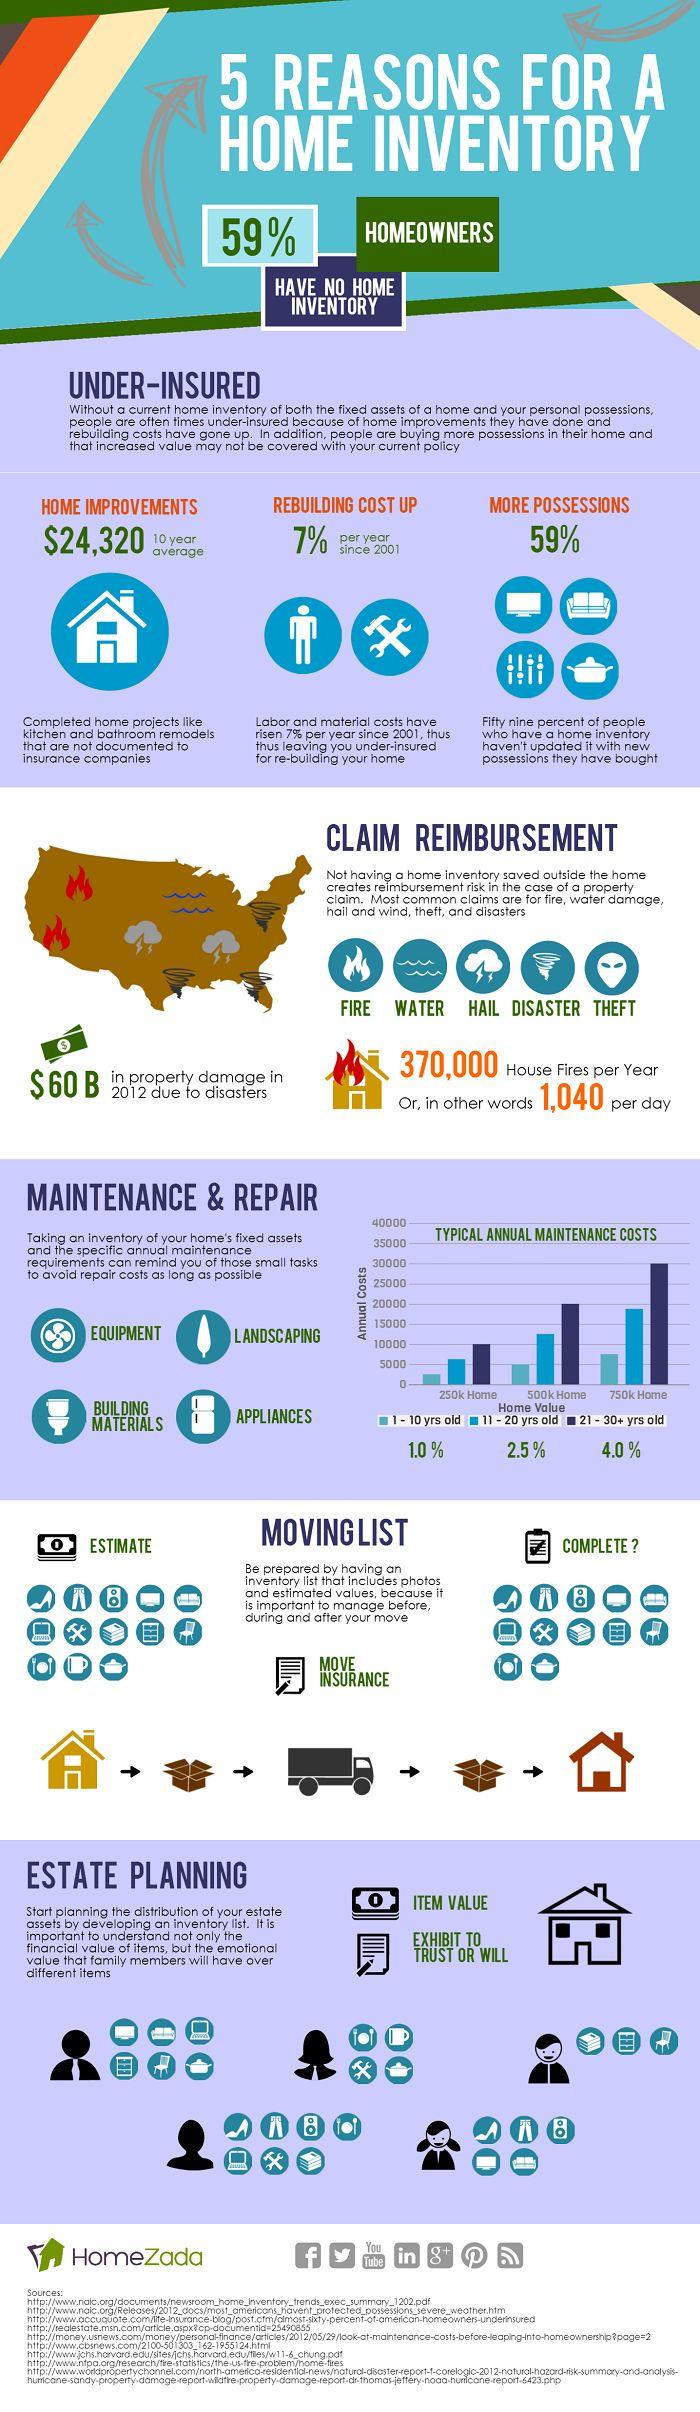 Home Inventory Infographic Homezada Home Inventory Home Maintenance Infographic